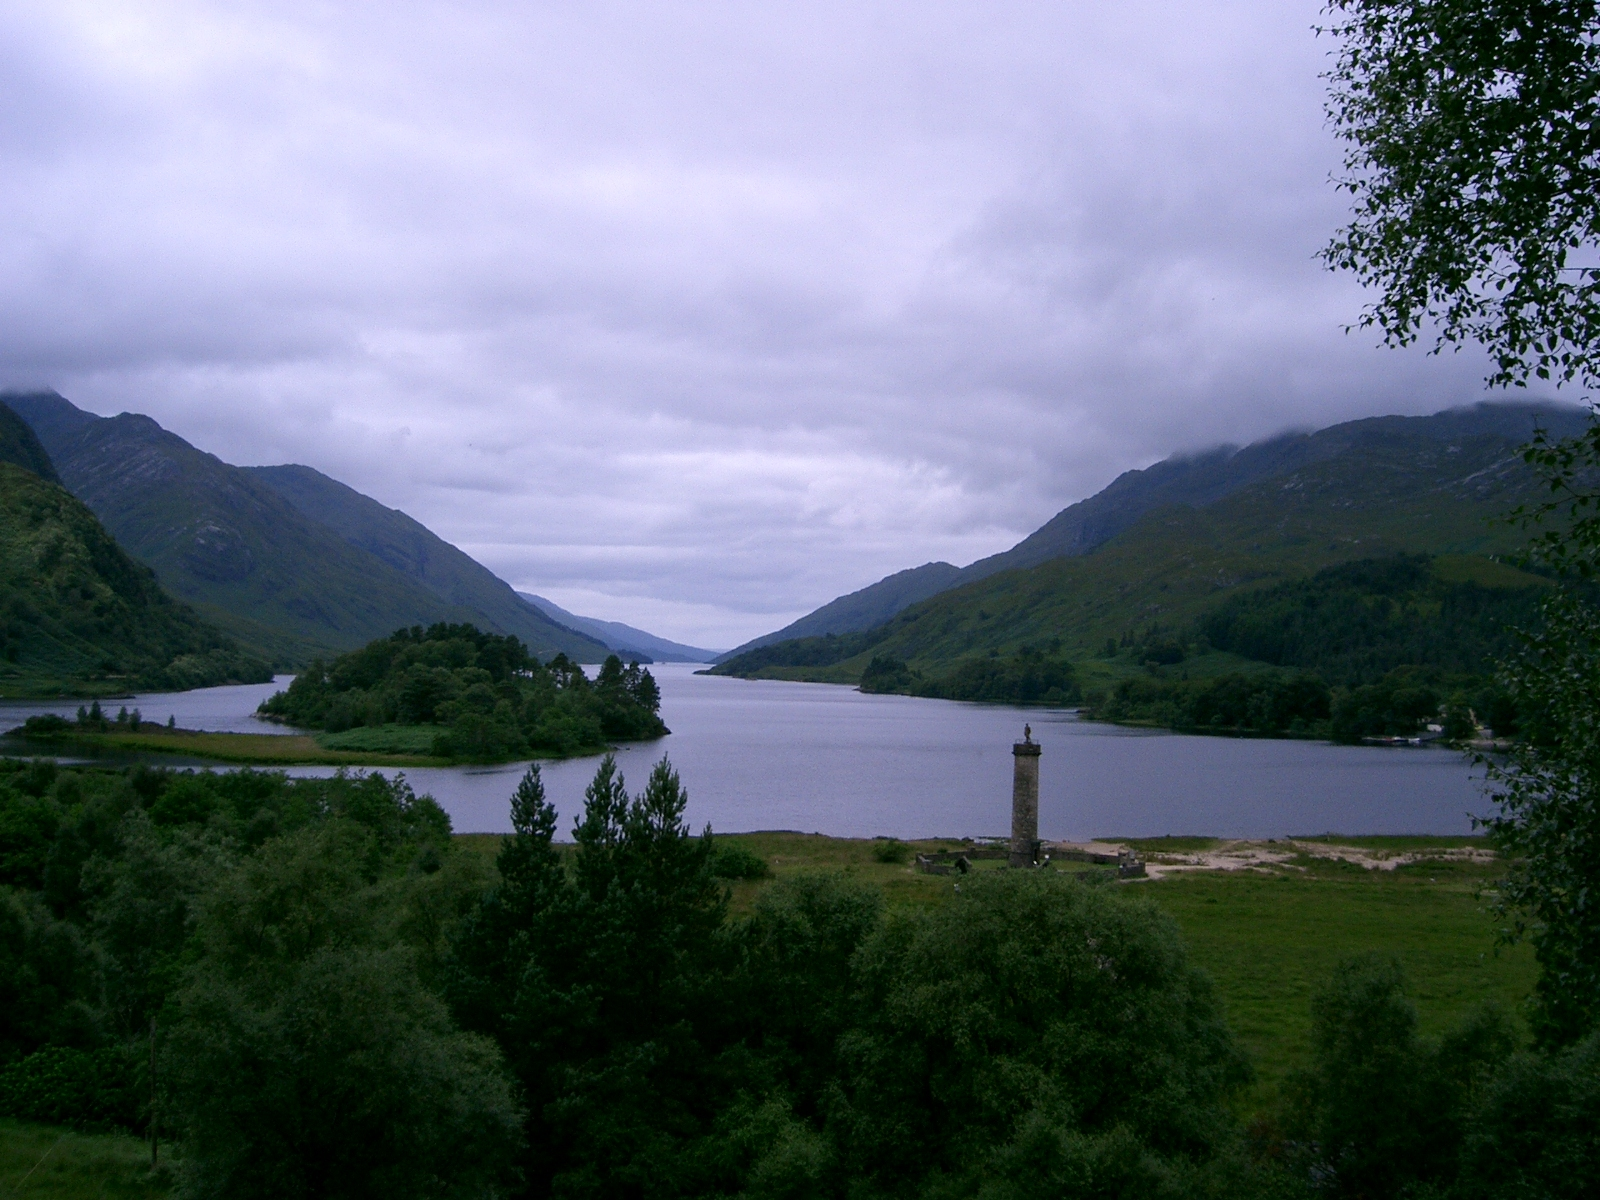 loch-shiel-glenfinnan-bay-scotland-